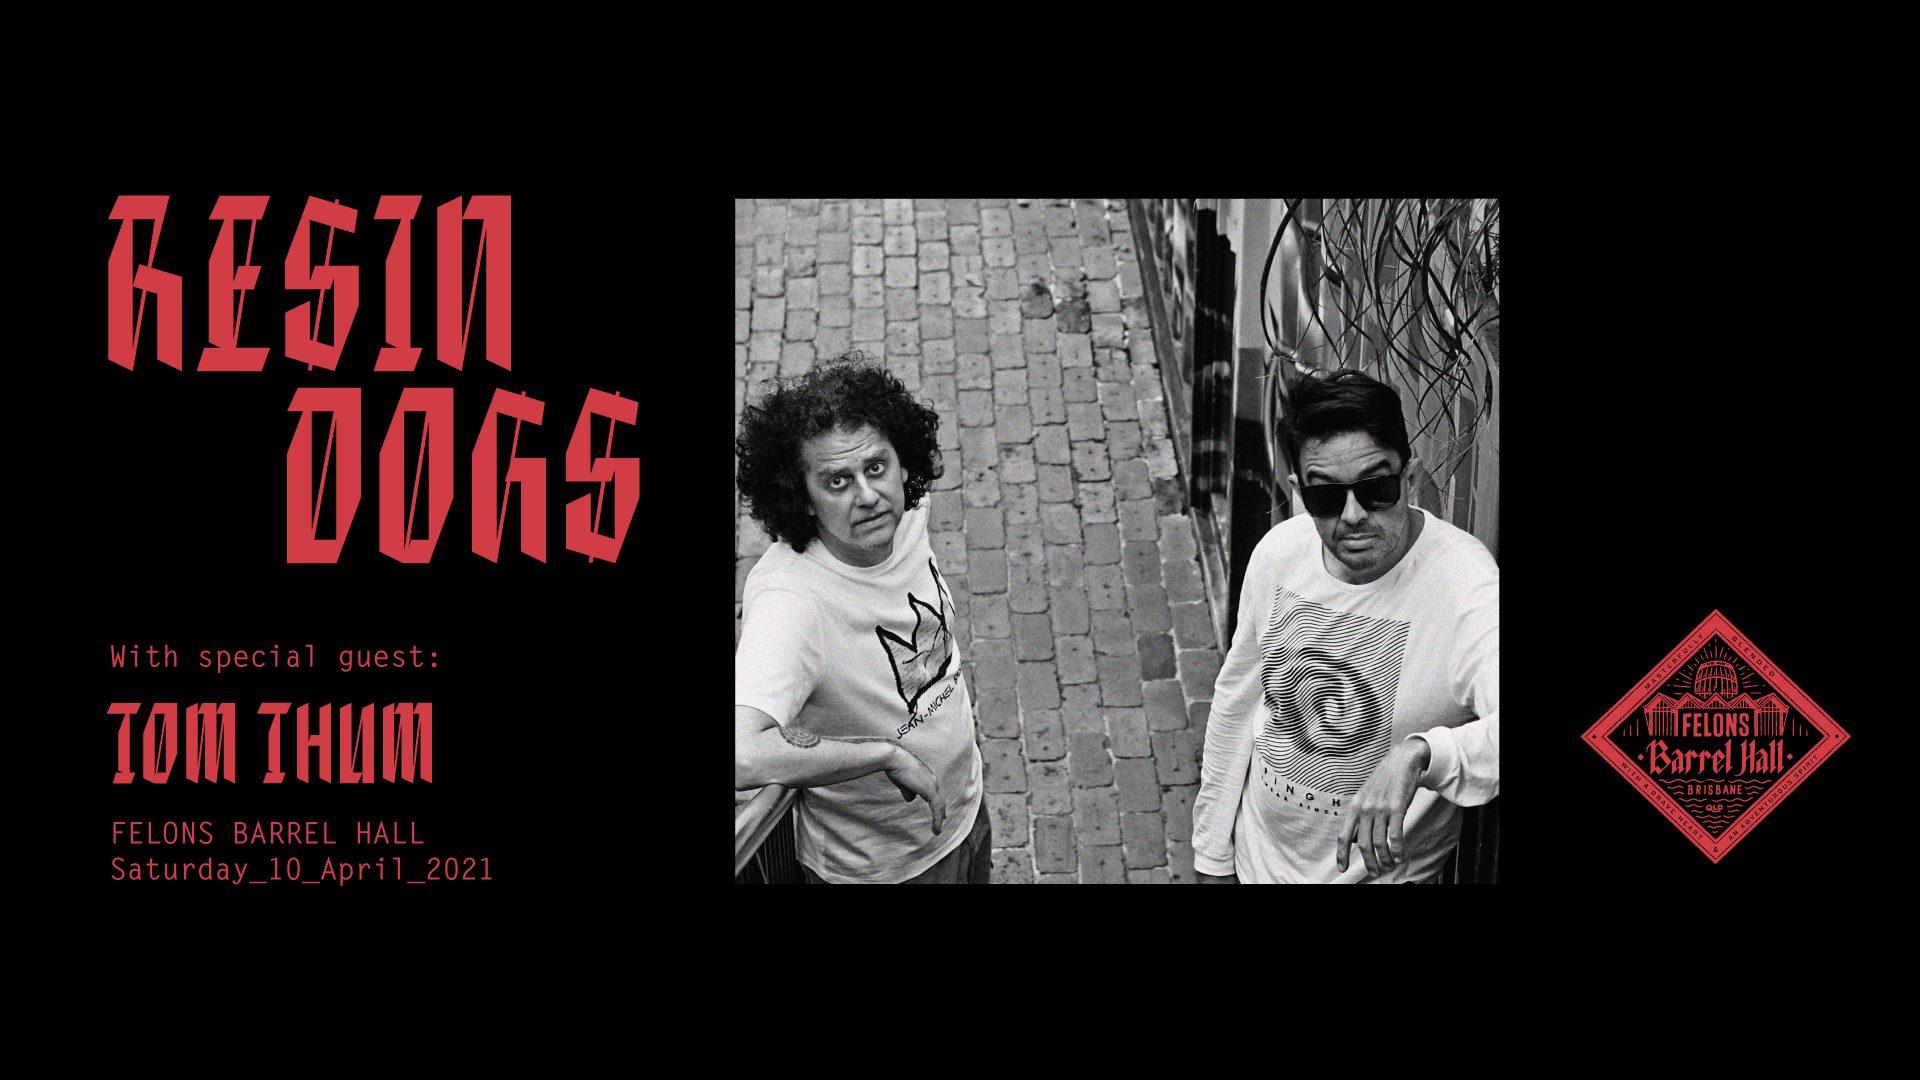 Brisbane Hip Hop Gigs: RESIN DOGS + TOM THUM | Felons Barrel Hall